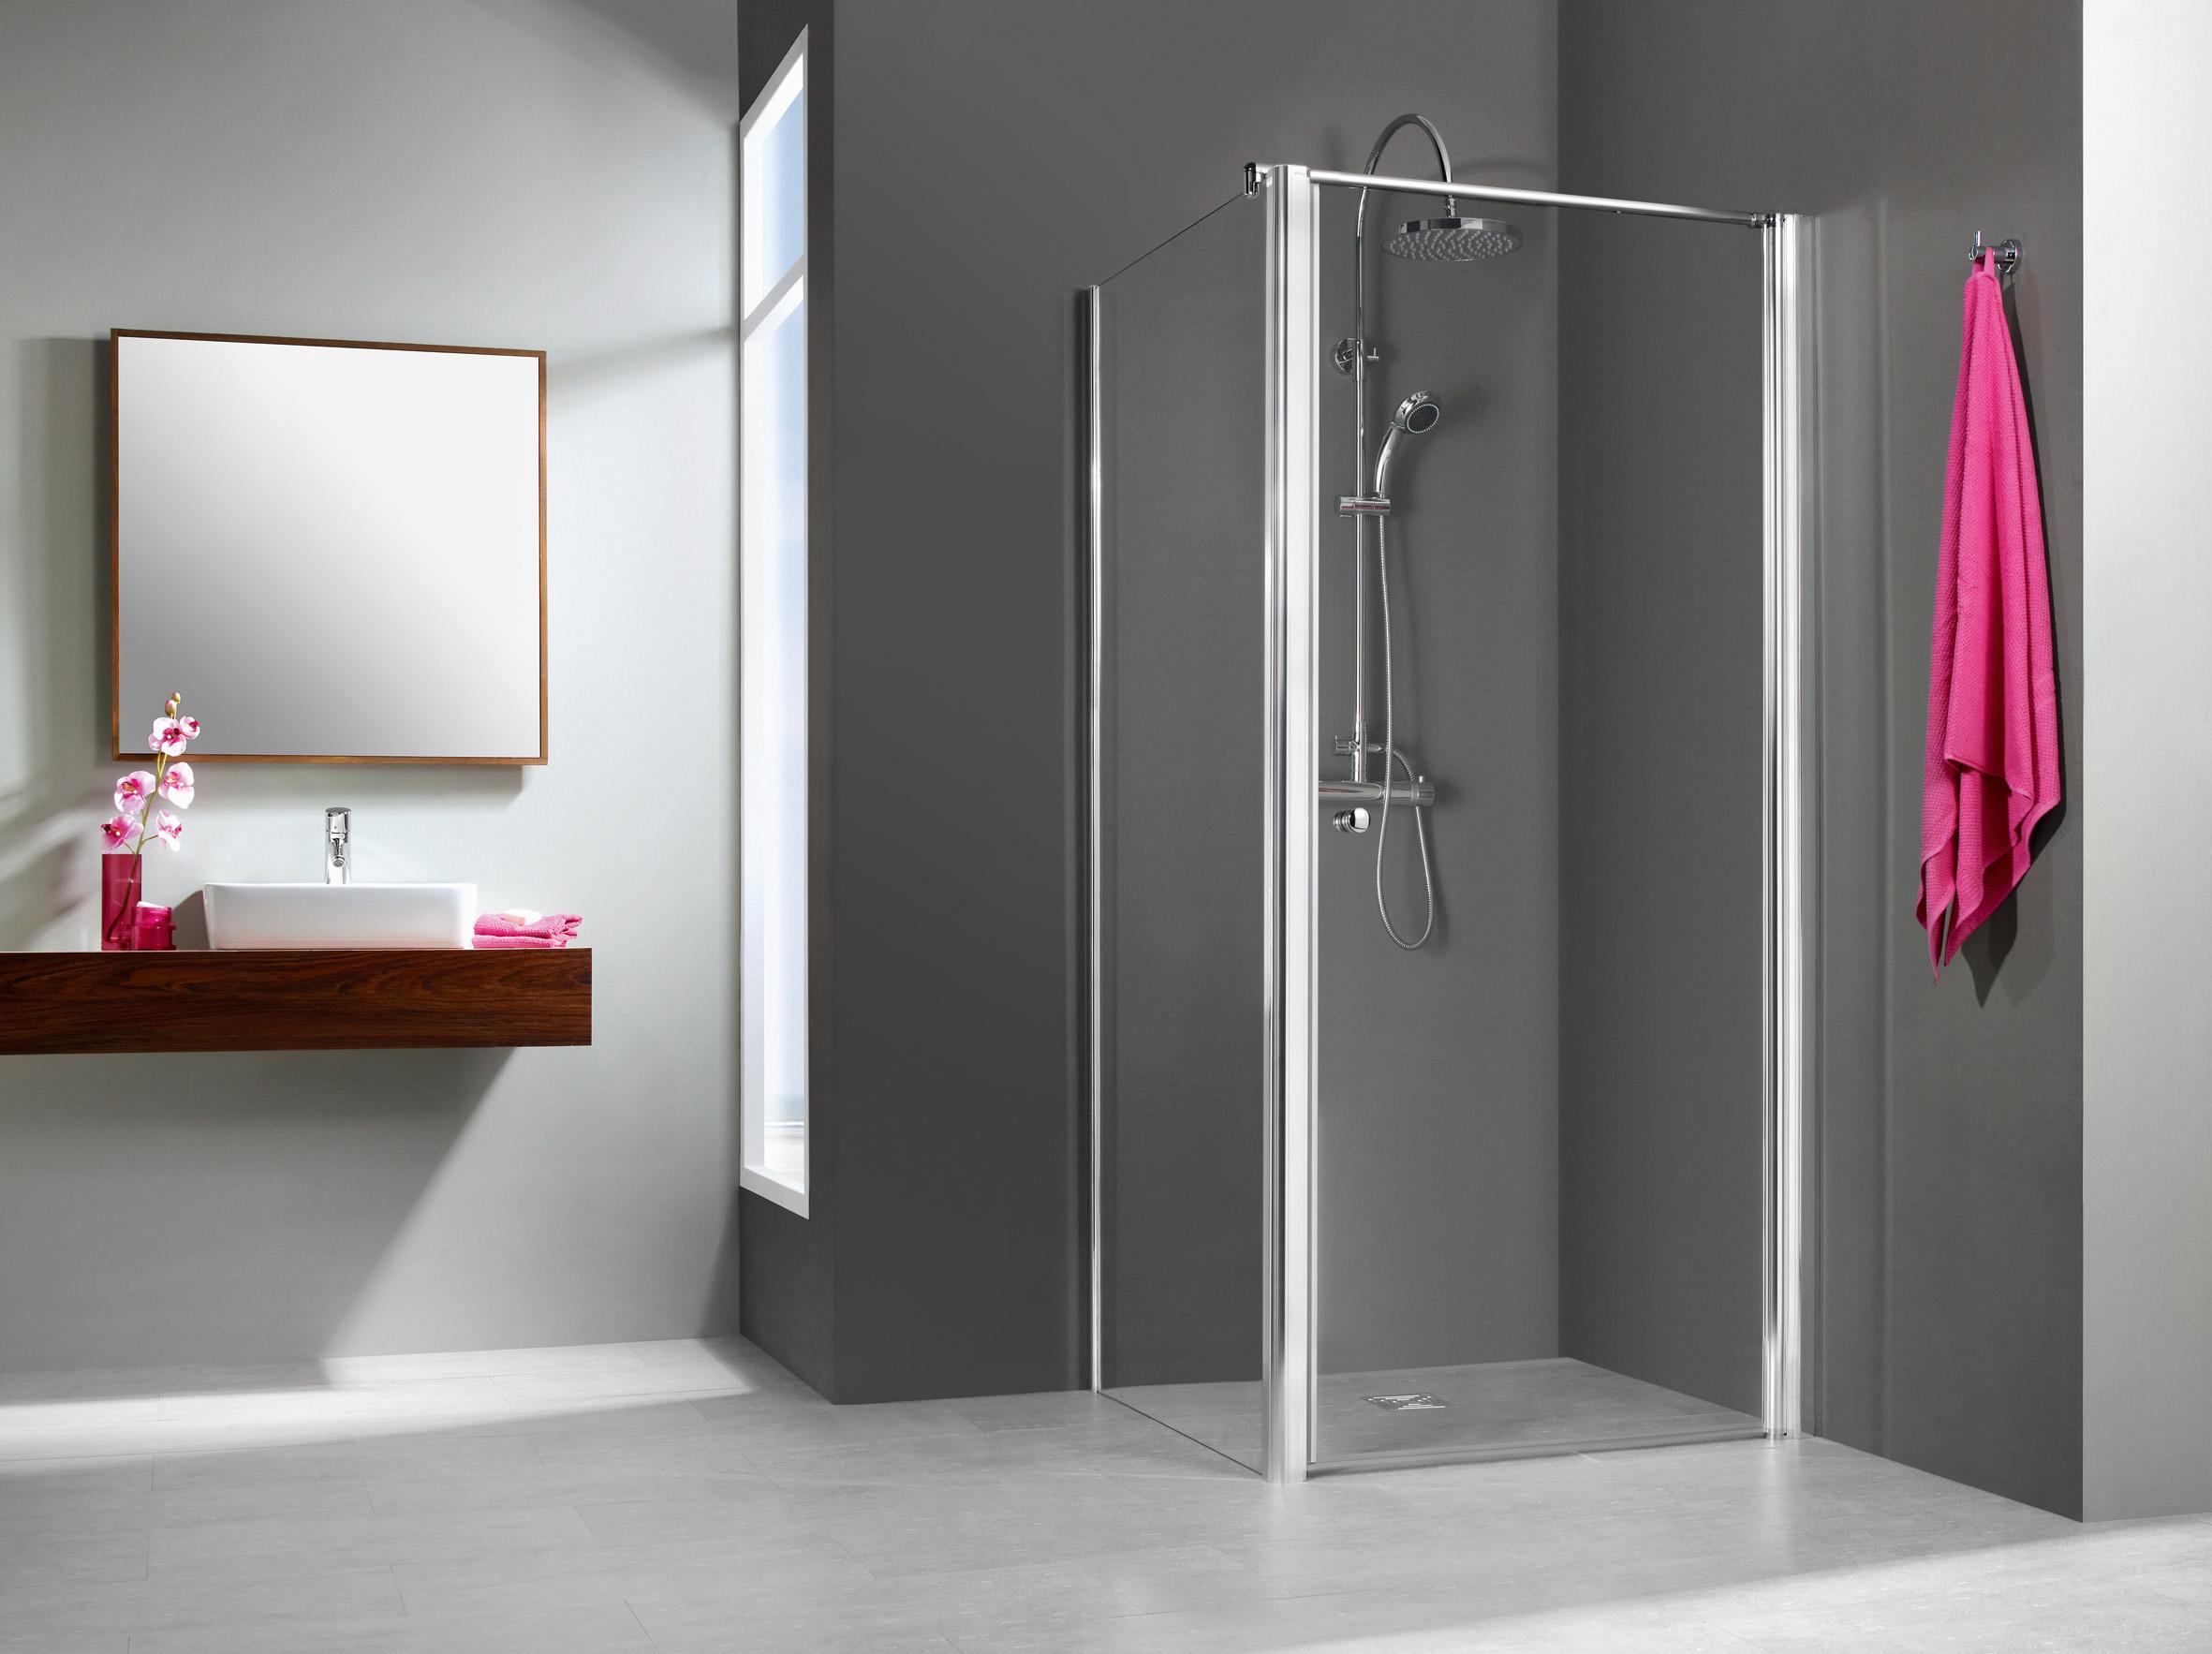 duschkabine dusche elana dreh schwingt r seitenwand 90x90x200. Black Bedroom Furniture Sets. Home Design Ideas